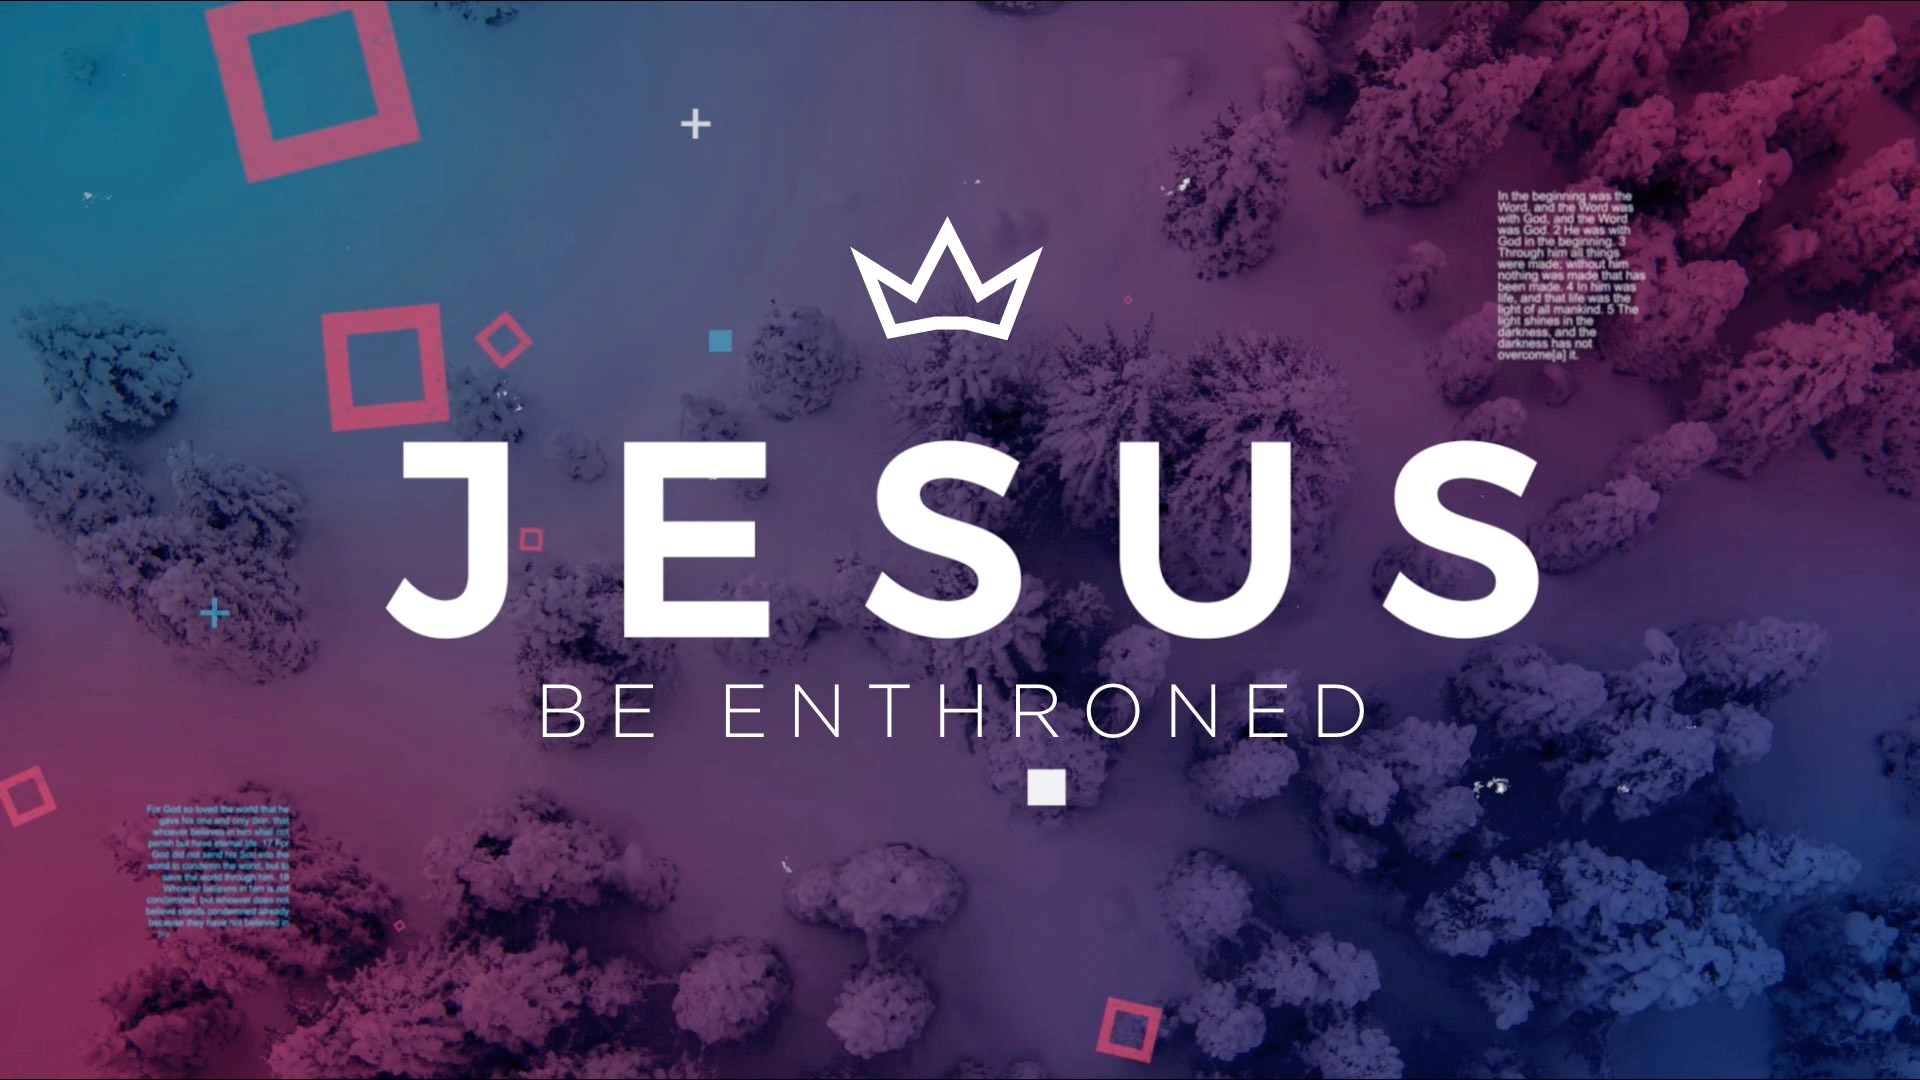 Series: Jesus, Be Enthroned